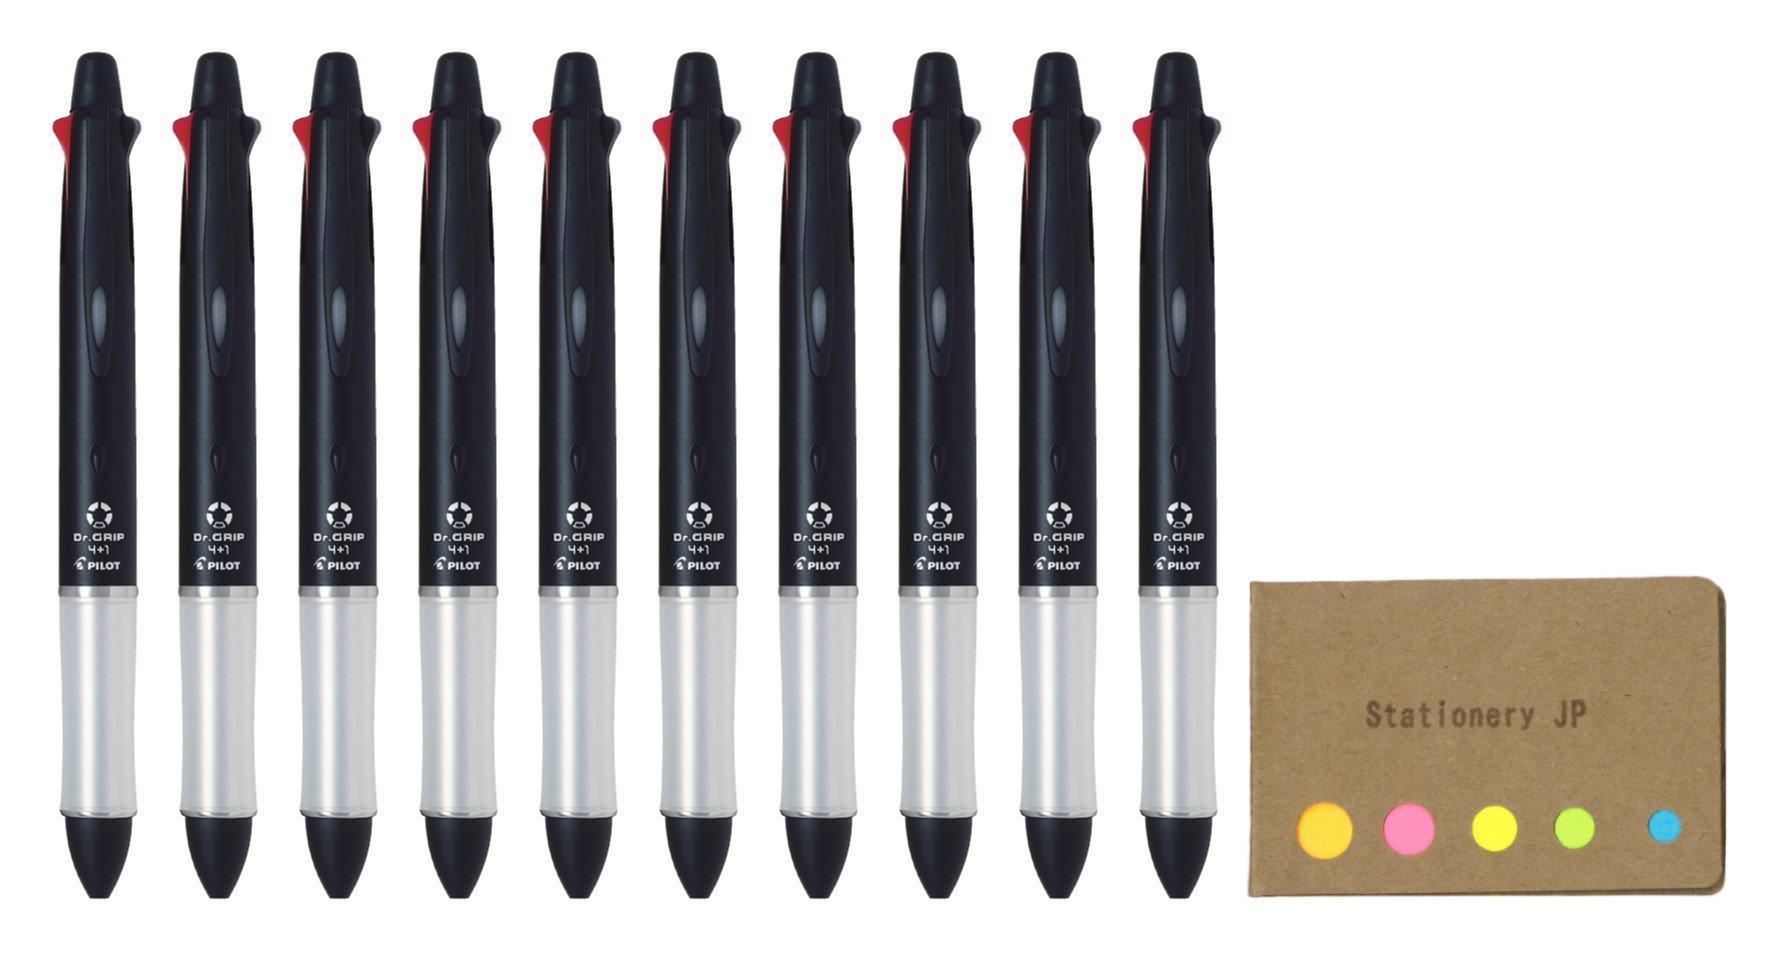 Pilot Mult Function Pen Dr.Grip 4+1, 0.7mm Acro Ink Ballpoint Pen, Black Body, 10-pack, Sticky Notes Value Set